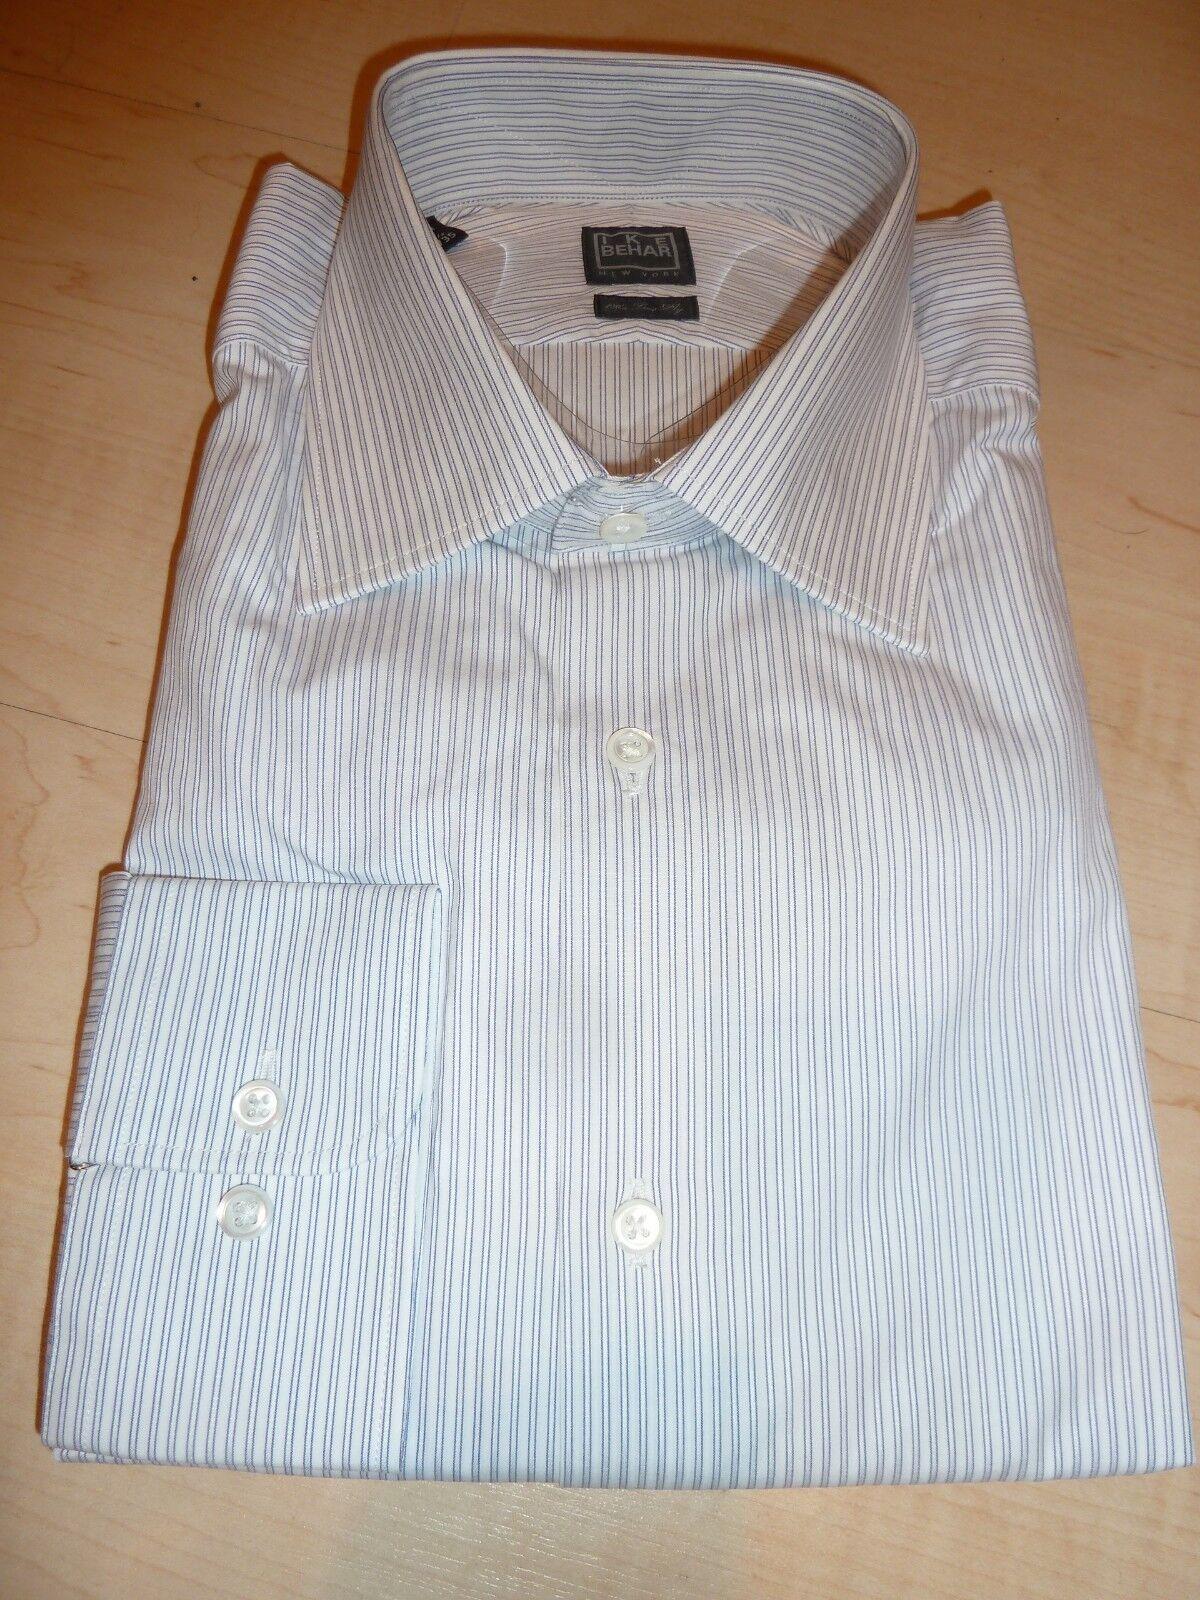 NEW  190 IKE BEHAR MENS SHIRT Sz 15.5 34 35 120s Two Ply Cotton Weiß stripe BC2